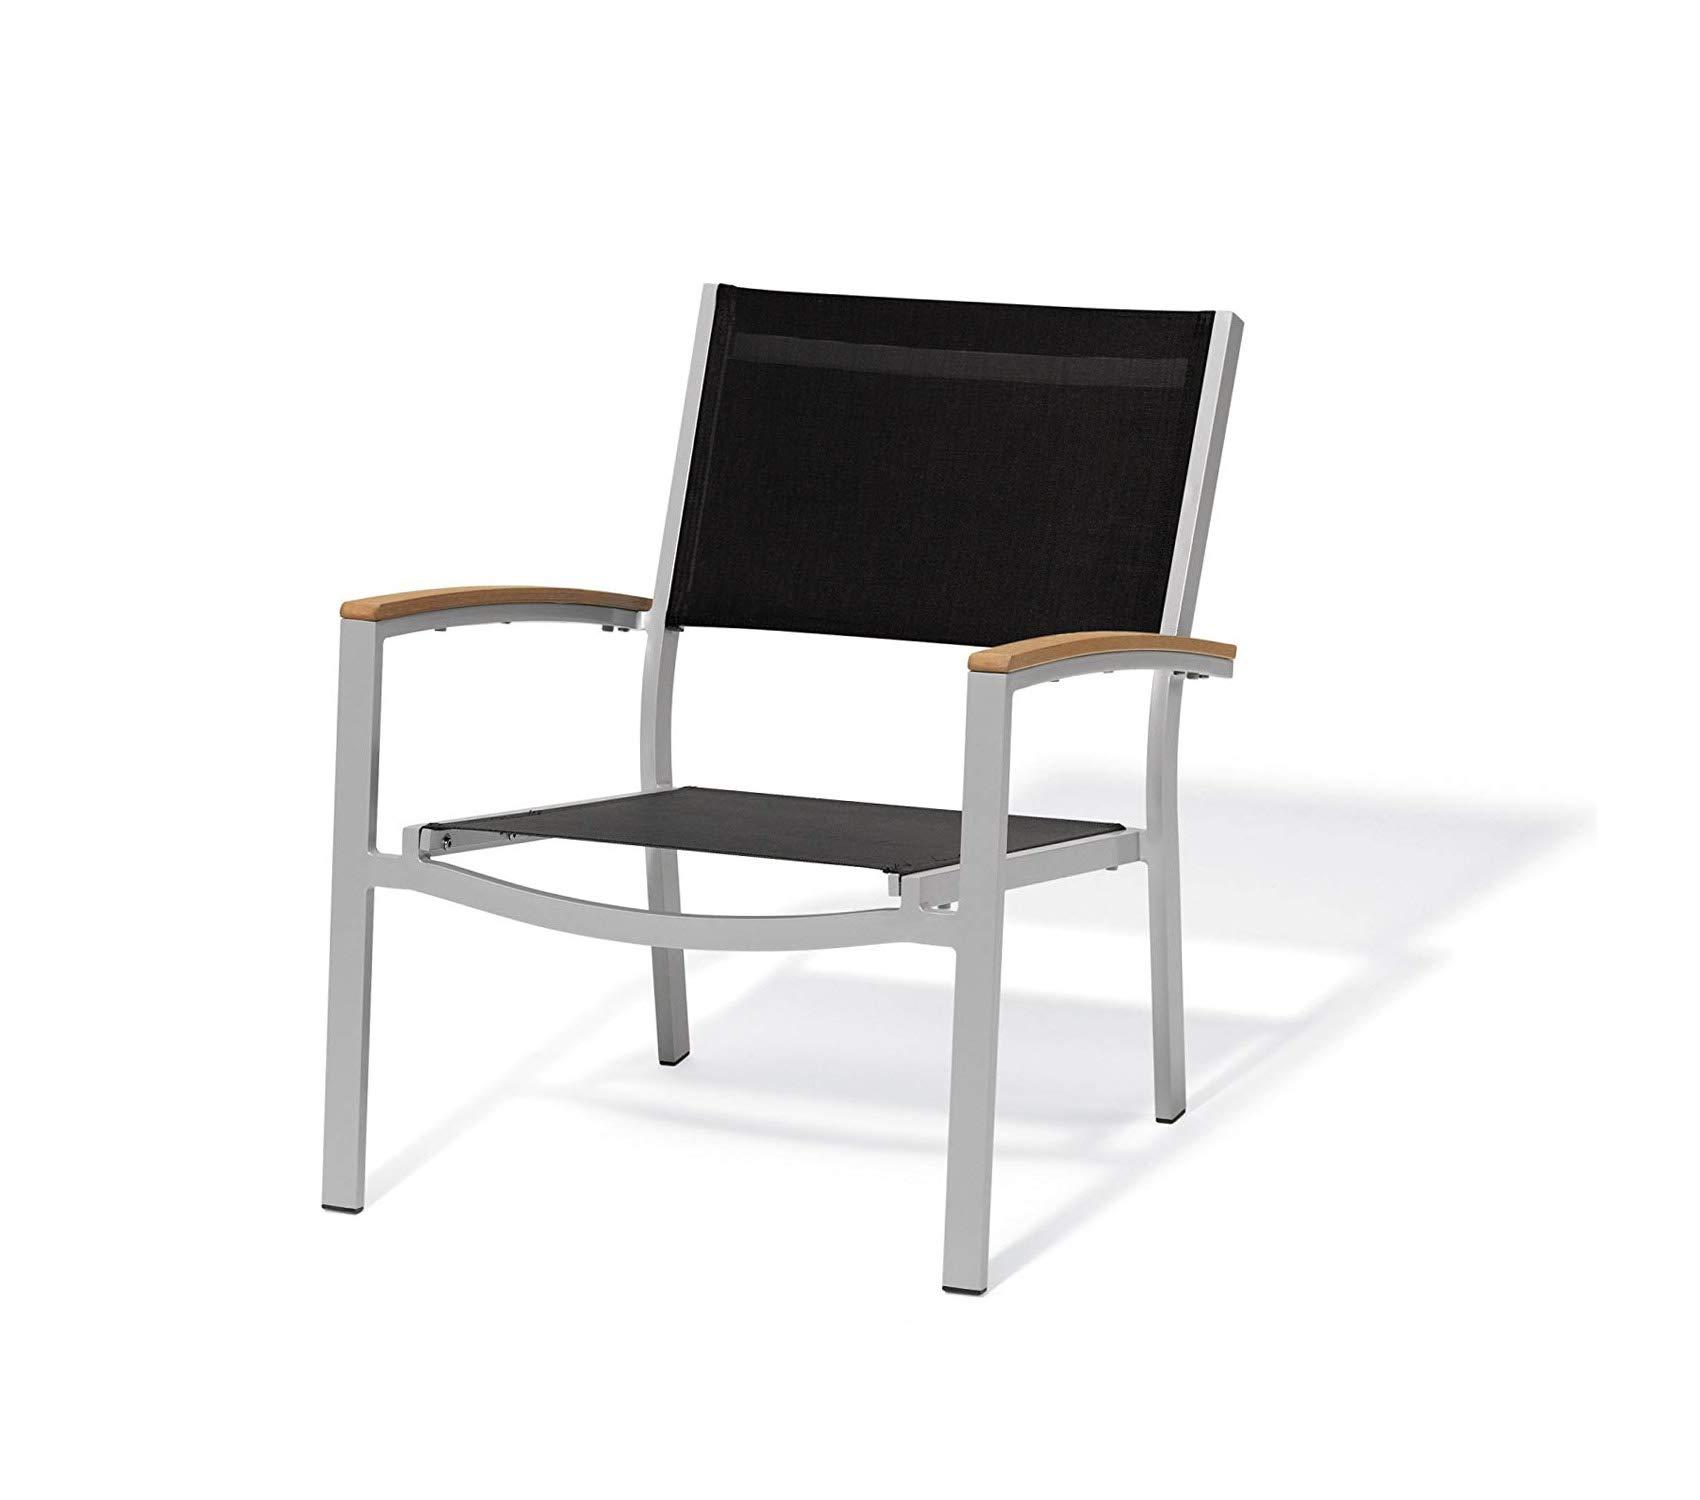 Wood & Style Patio Outdoor Garden Premium Chat Chair - Black Sling Seat - Teak Armcaps - Set of 2